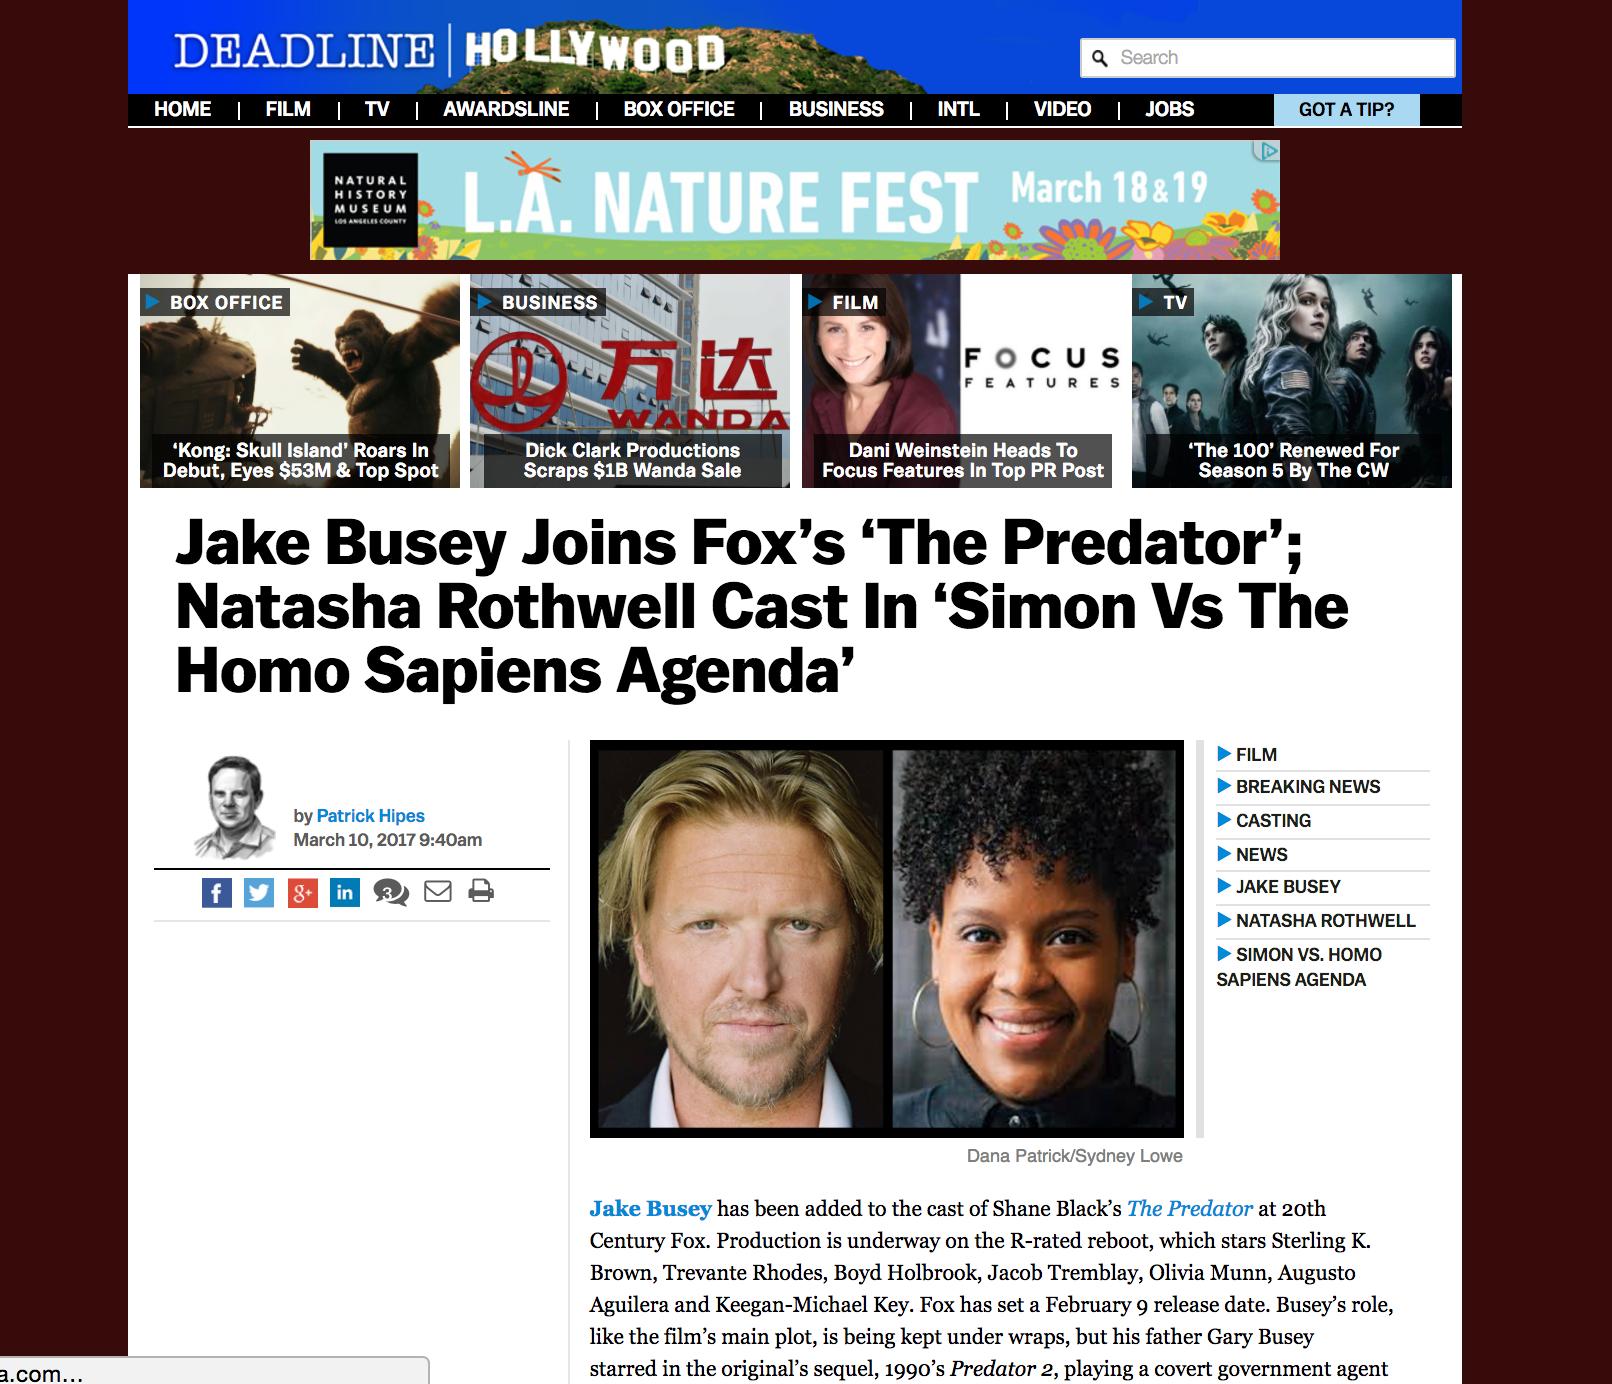 "Deadline Hollywood: ""Natasha Rothwell Cast in 'Simon Vs The Homo Sapiens Agenda'"" - March 2017"